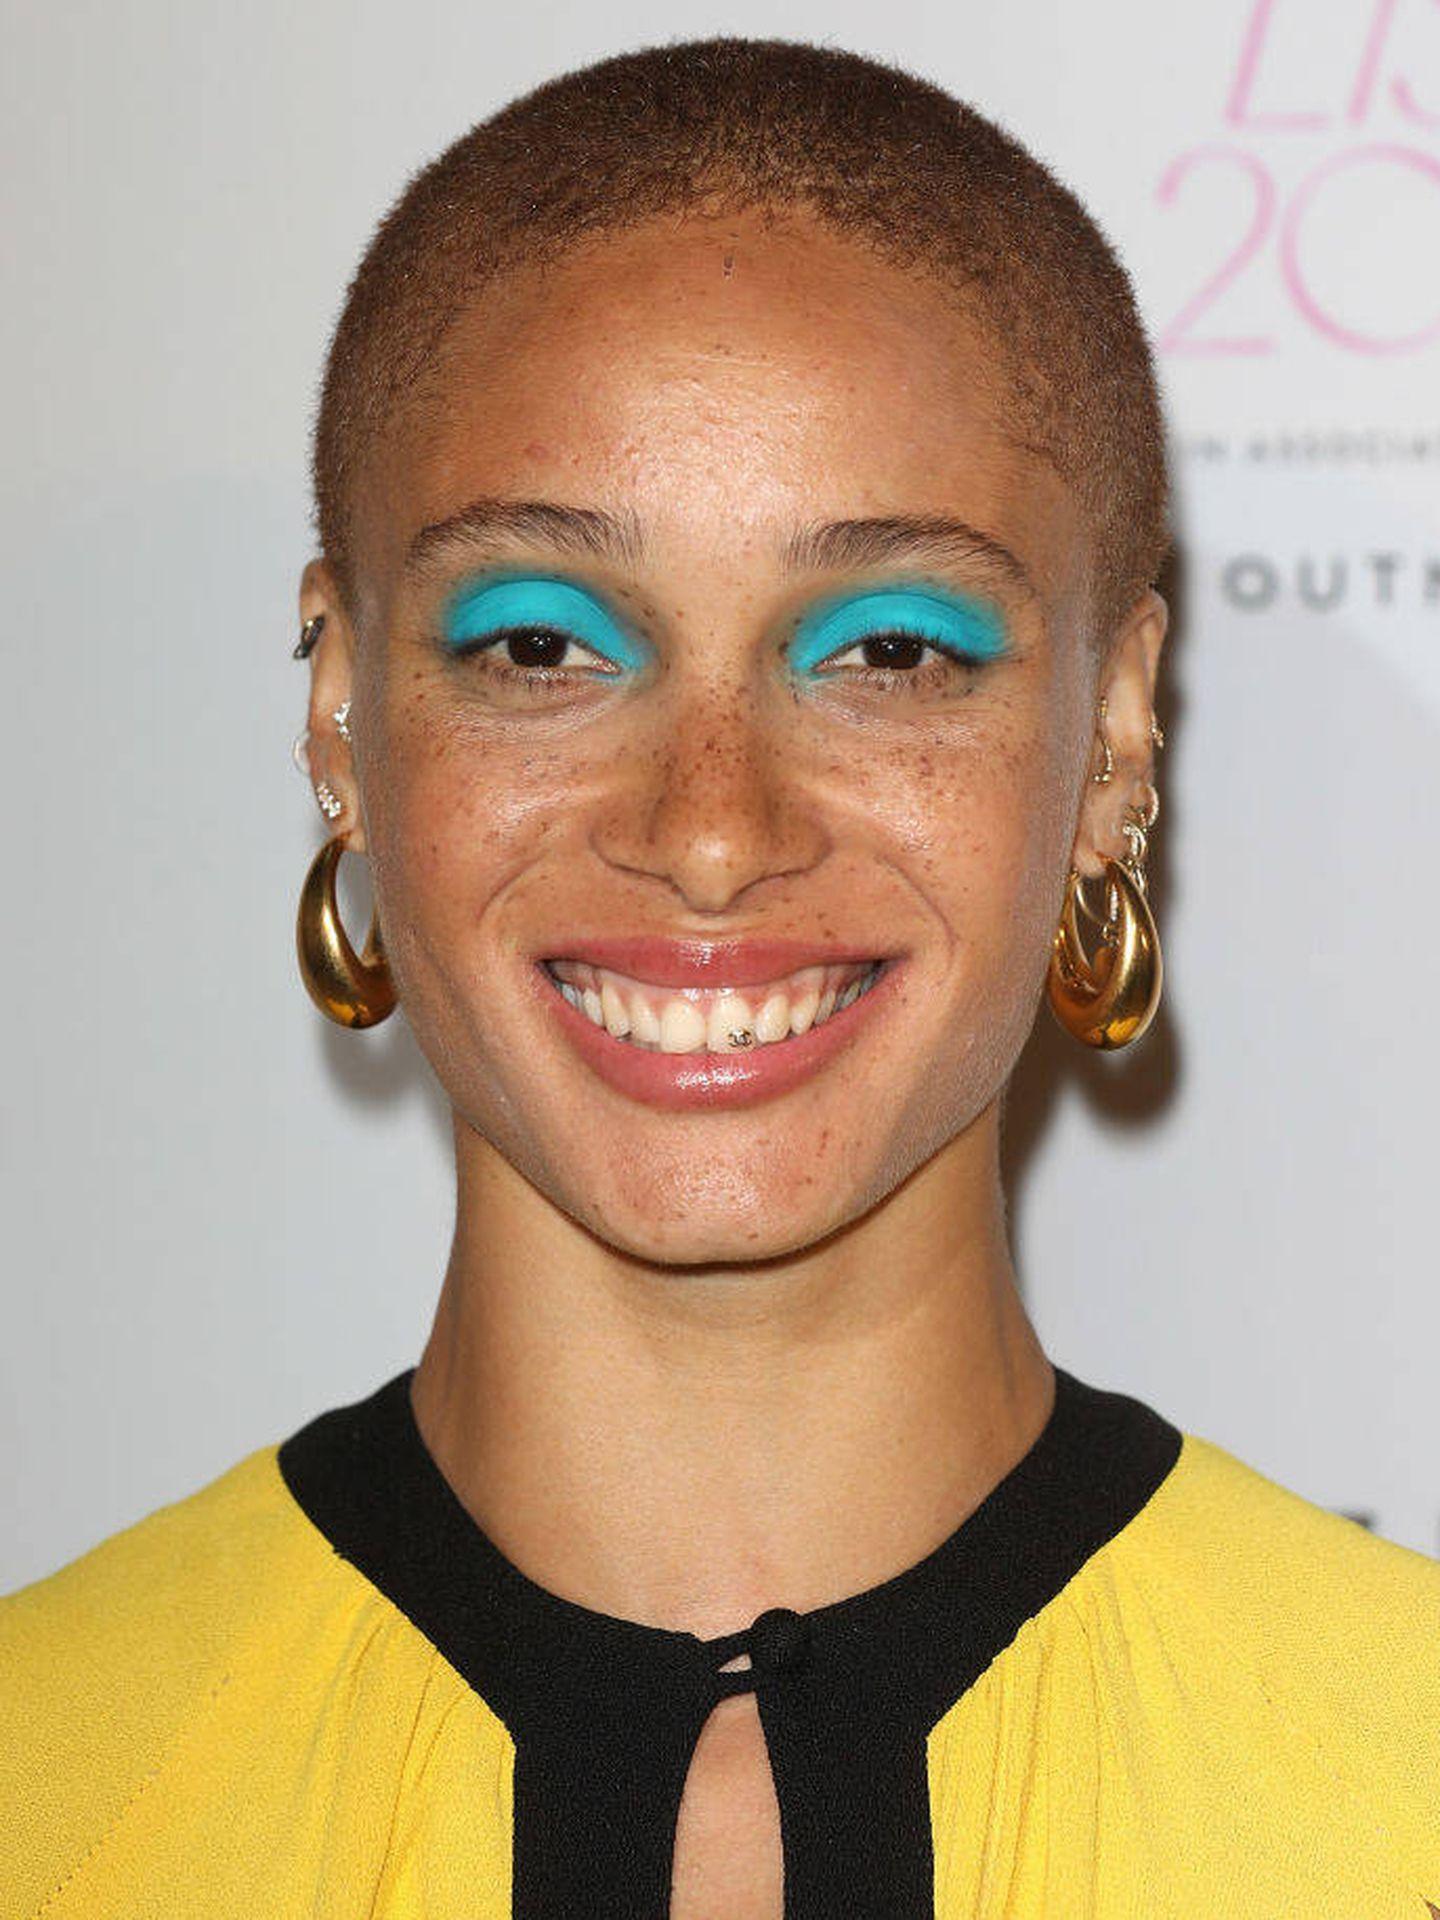 Adwoa Aboah, con sombras de ojos azul Capri. (Getty)